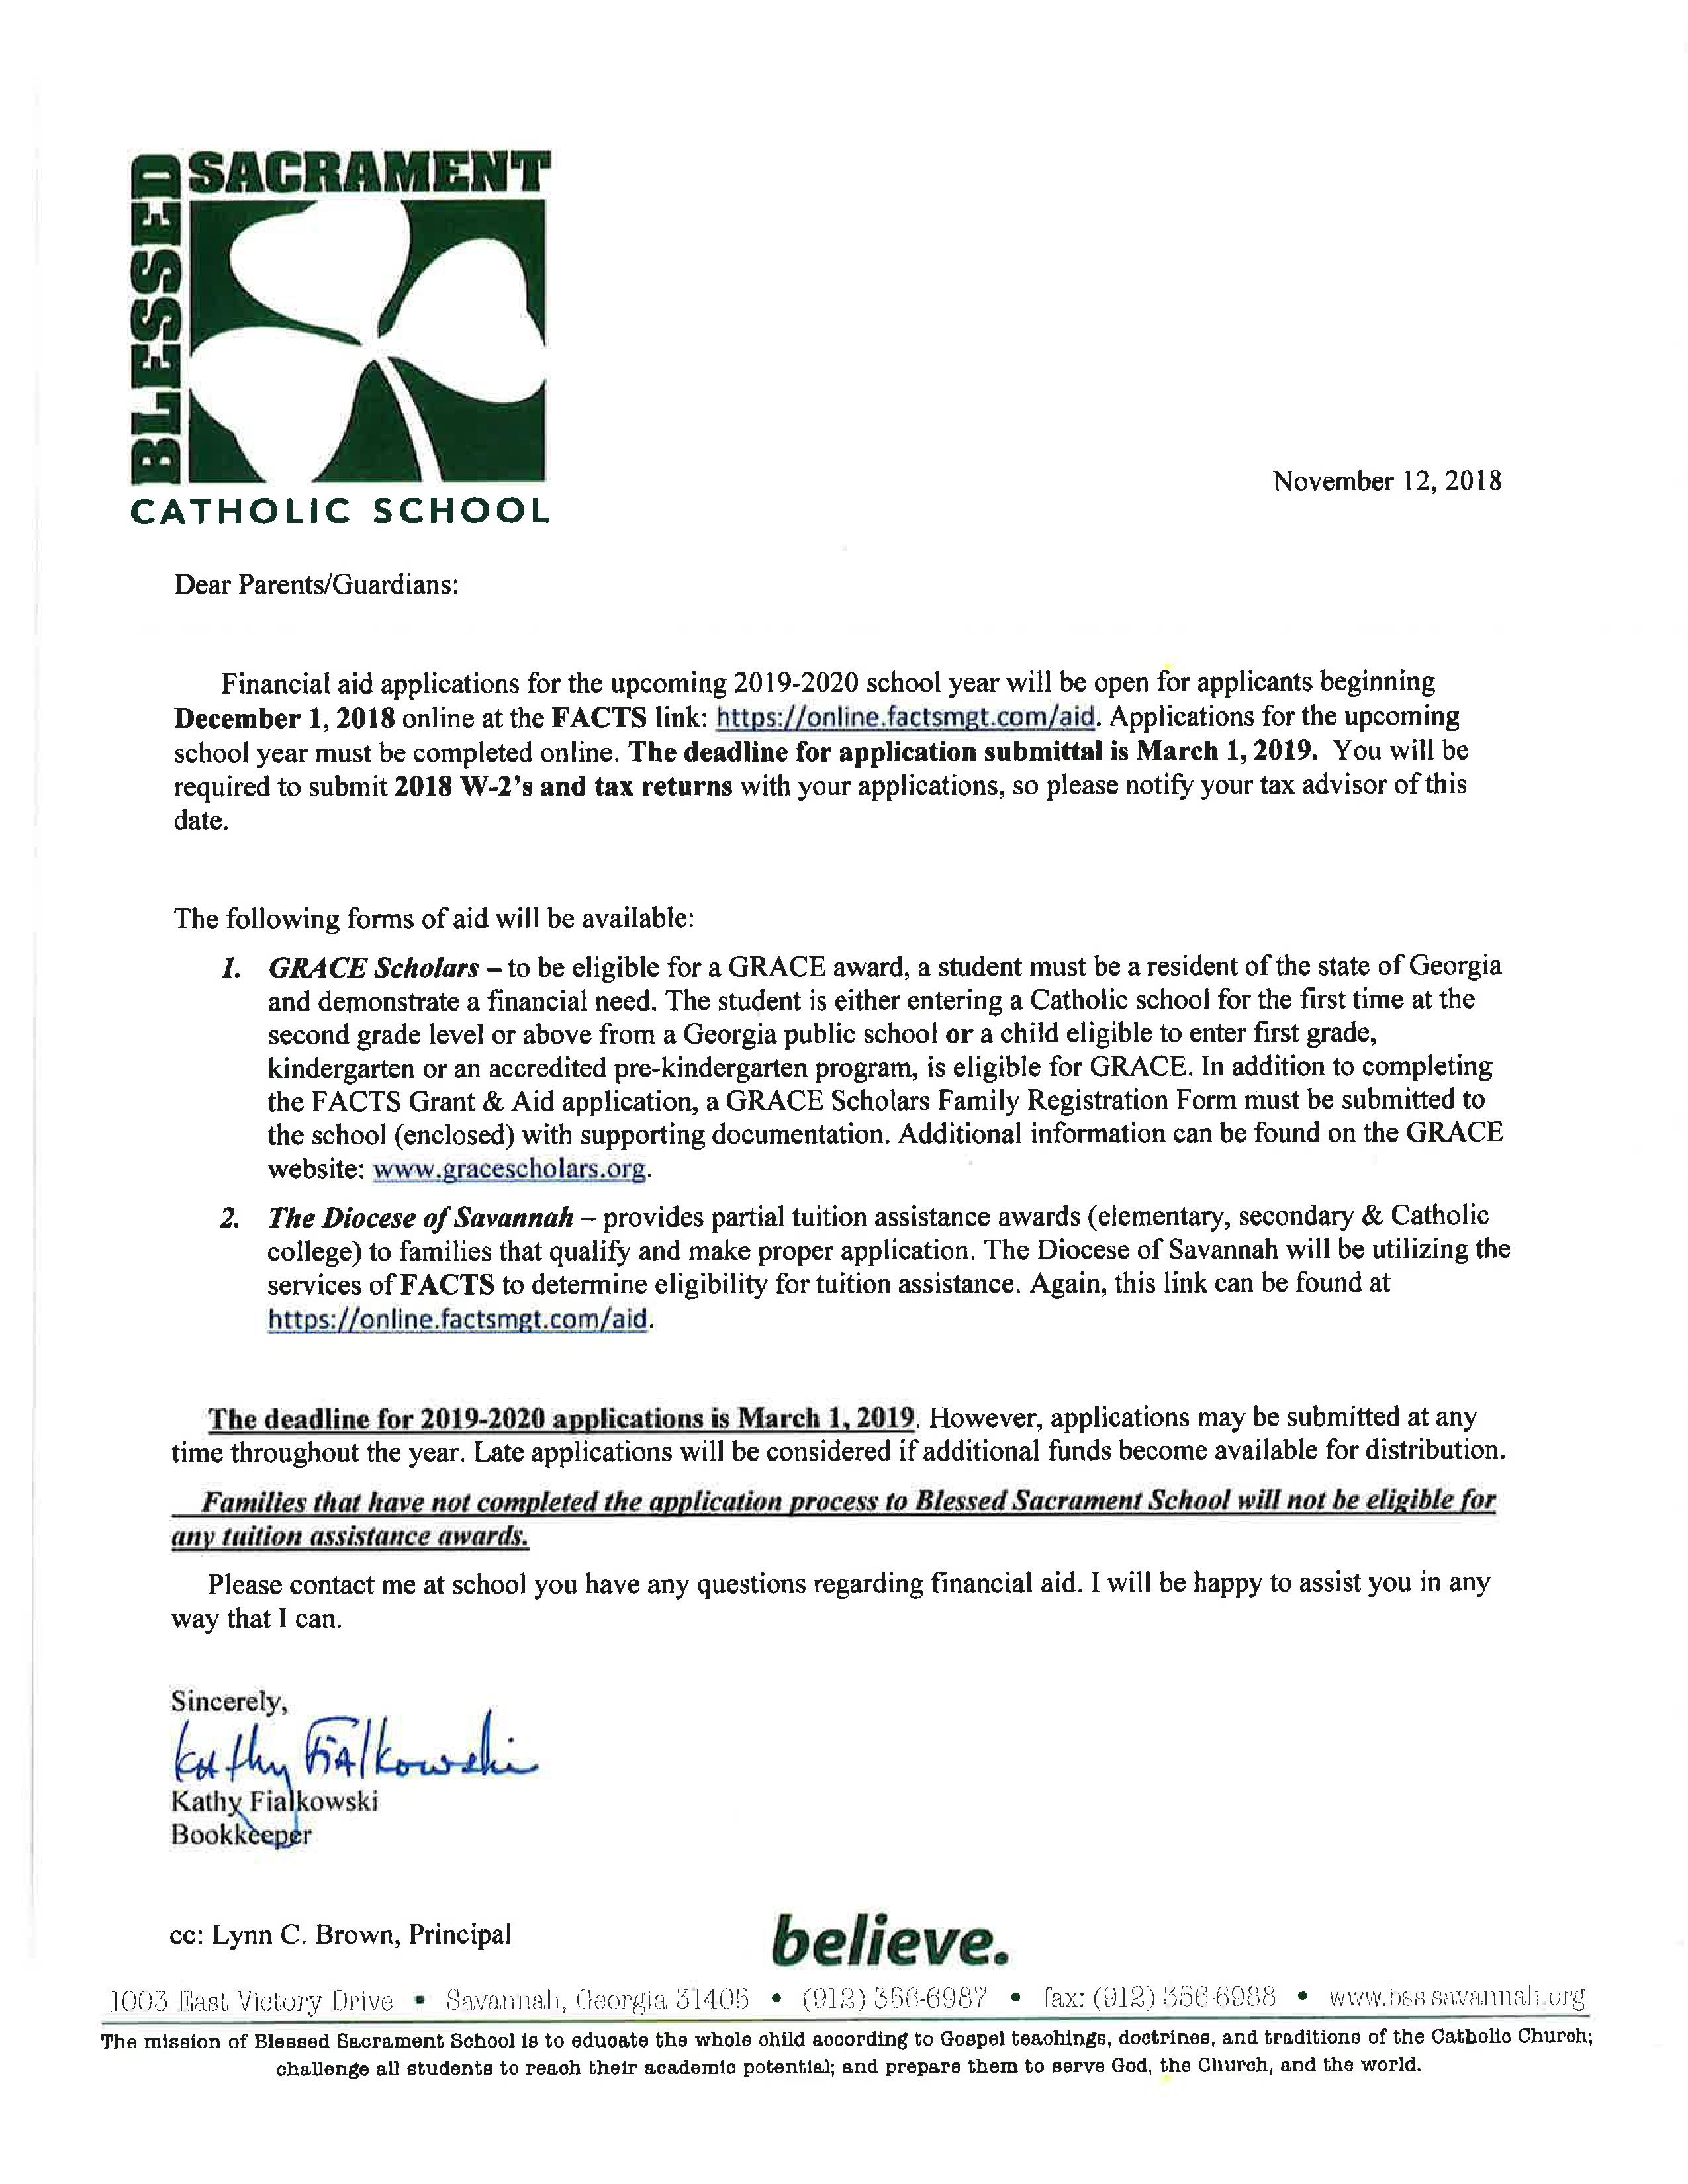 2019-2020 Parent Letter - Blessed Sacrament Catholic School inside Catholic Liturgical Calendar Year C 2019-2020